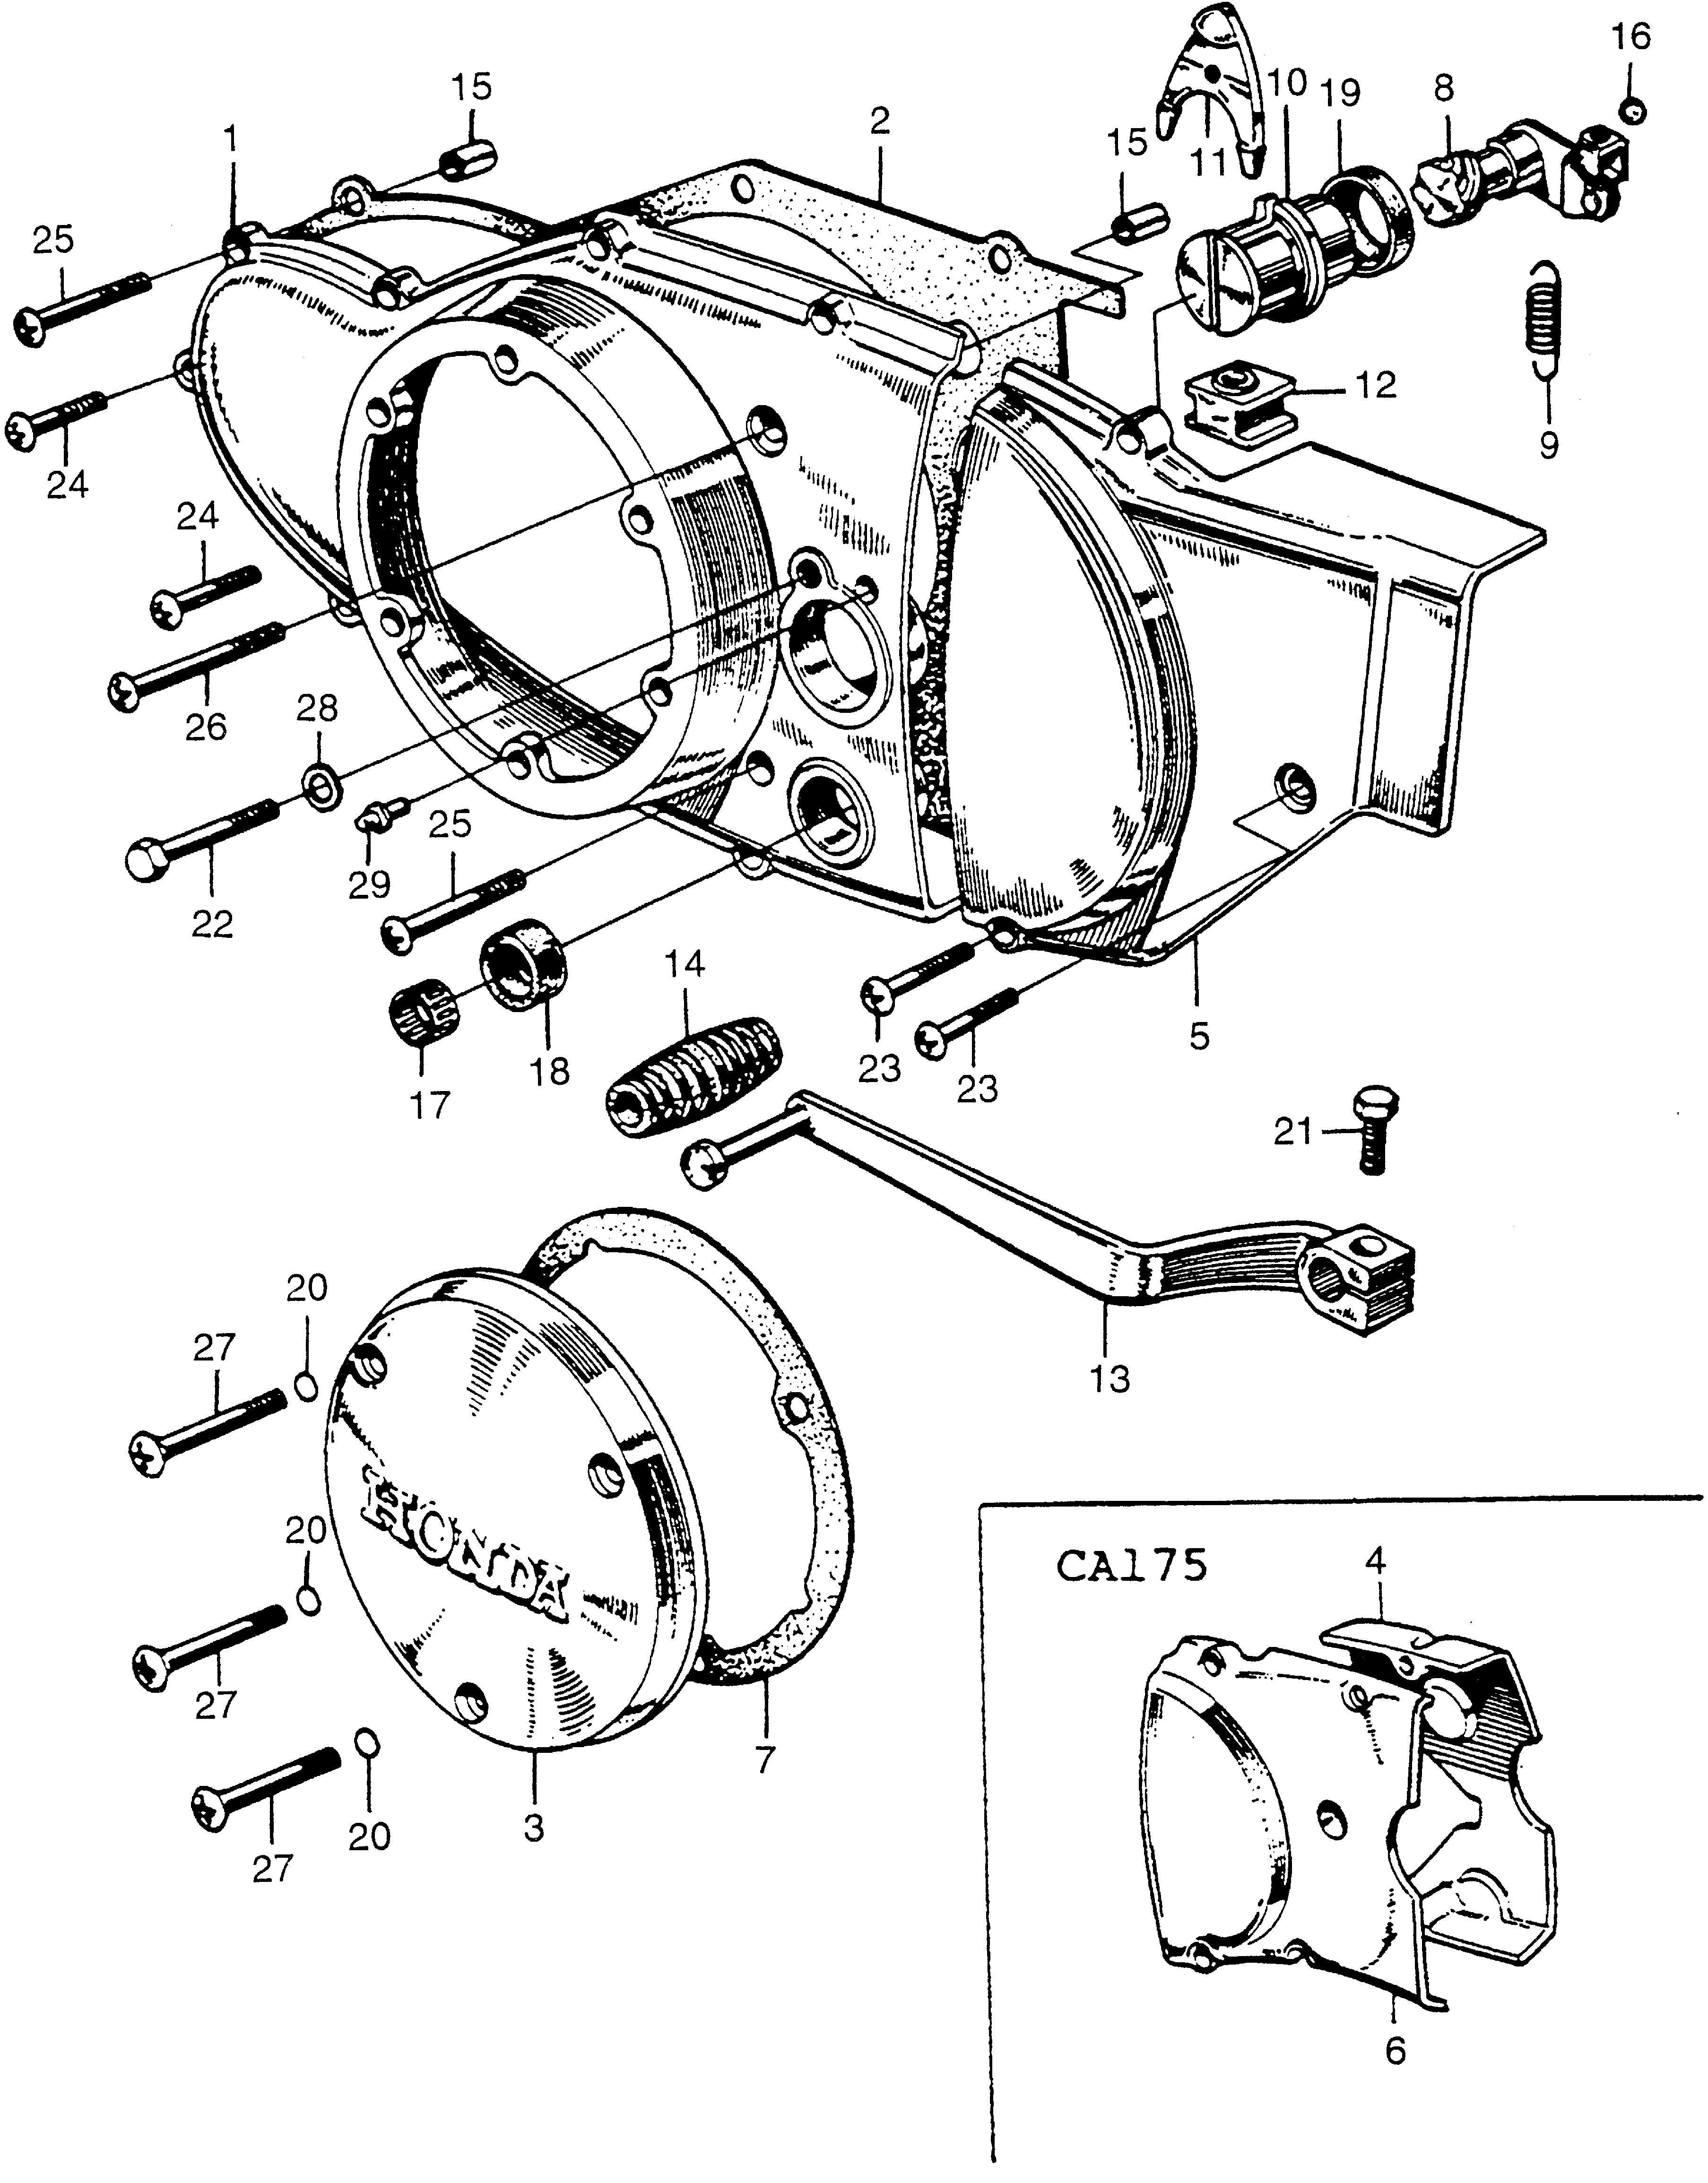 clutch adjuster left crankcase cover fits 1968 honda cl175 van 1968 Honda 450 Motorcycle clutch adjuster left crankcase cover fits 1968 honda cl175 van wall honda powersports